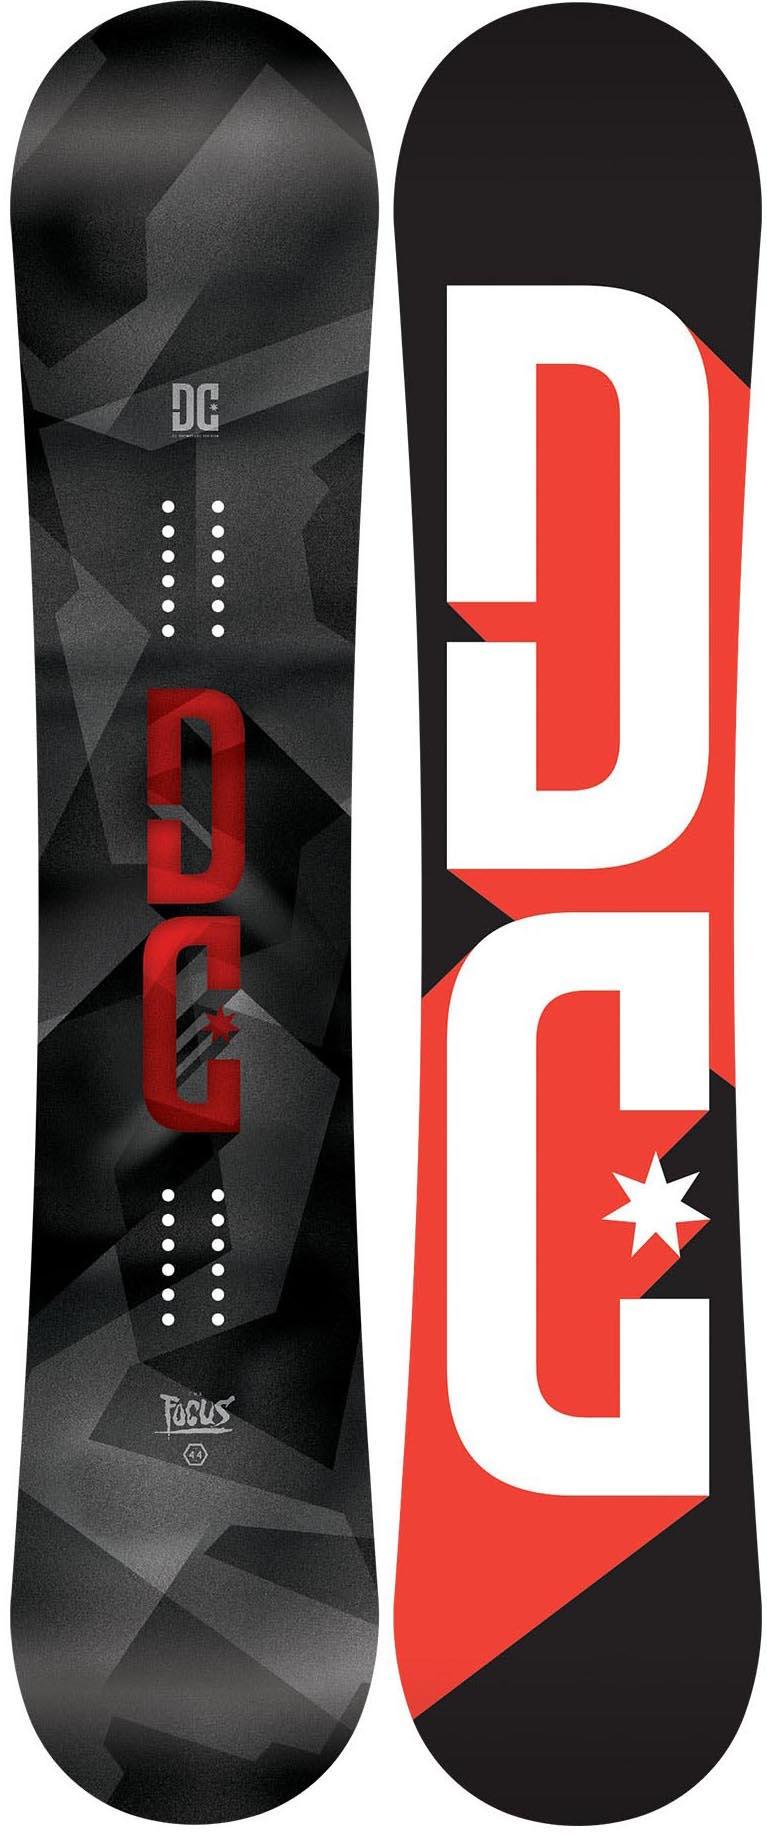 image dc-focus-144-jpg